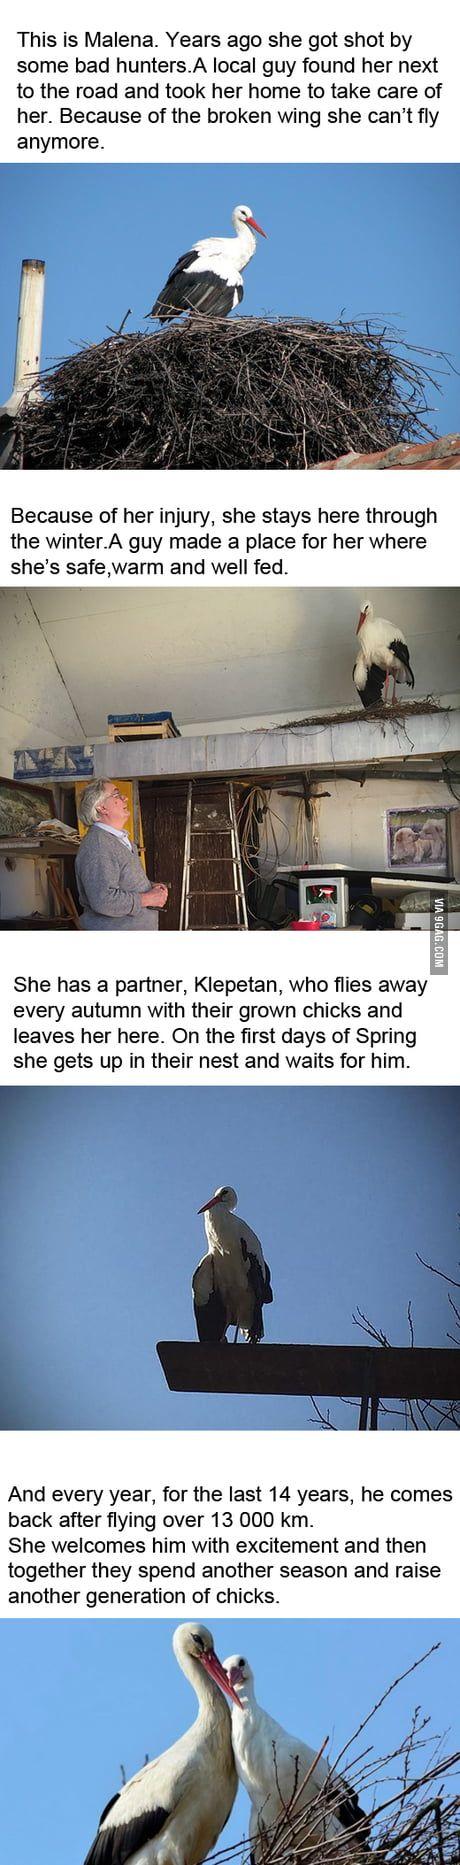 A heartwarming love story from Croatia